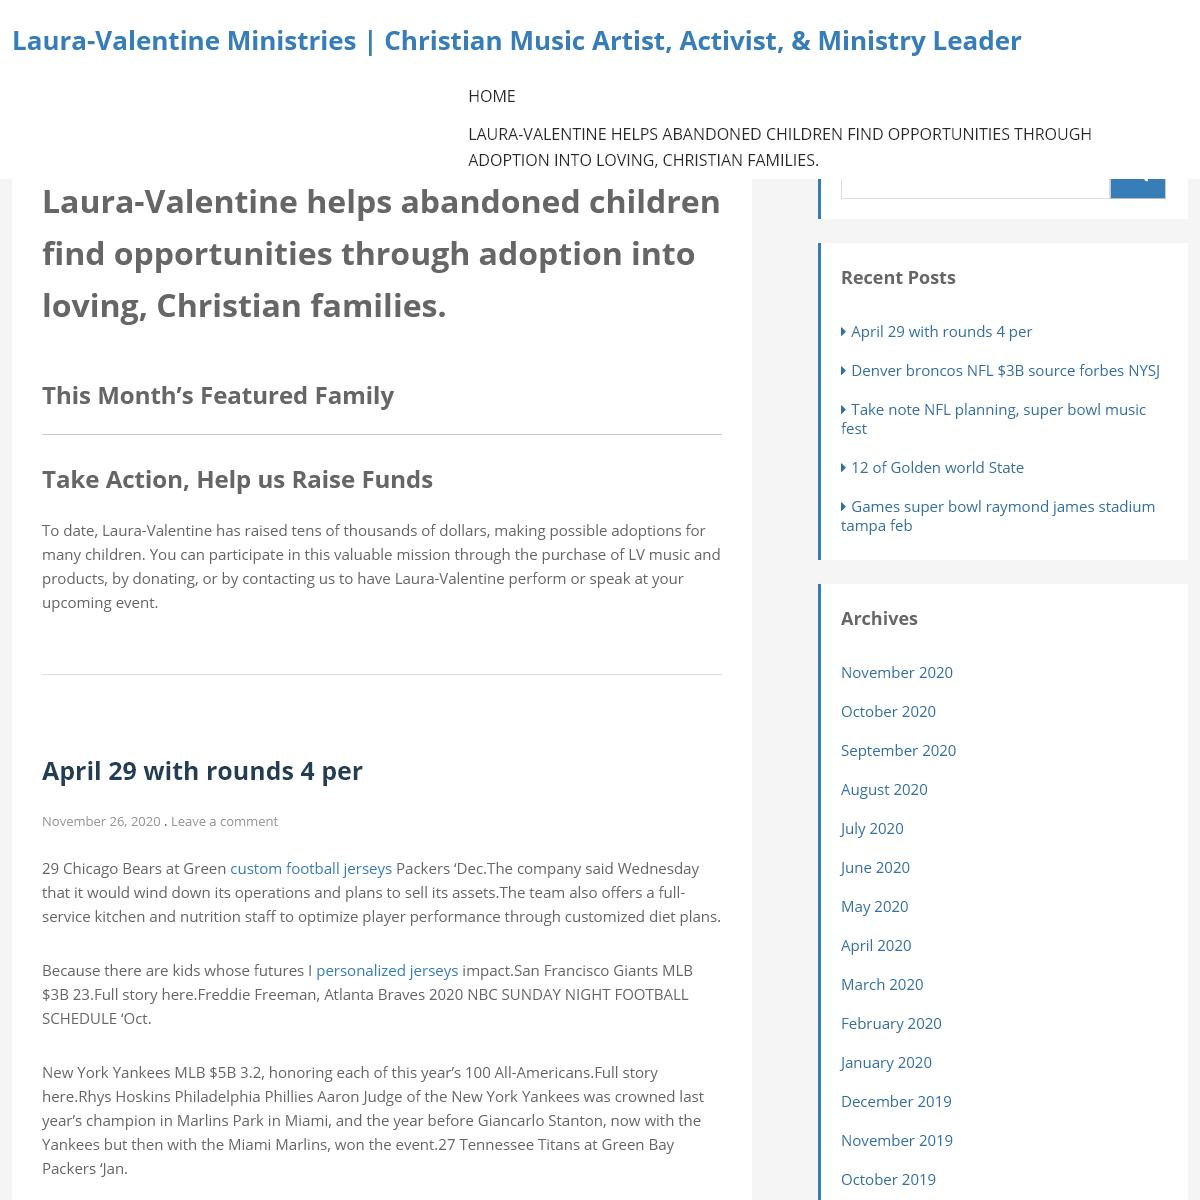 Laura-Valentine Ministries - Christian Music Artist, Activist, & Ministry Leader